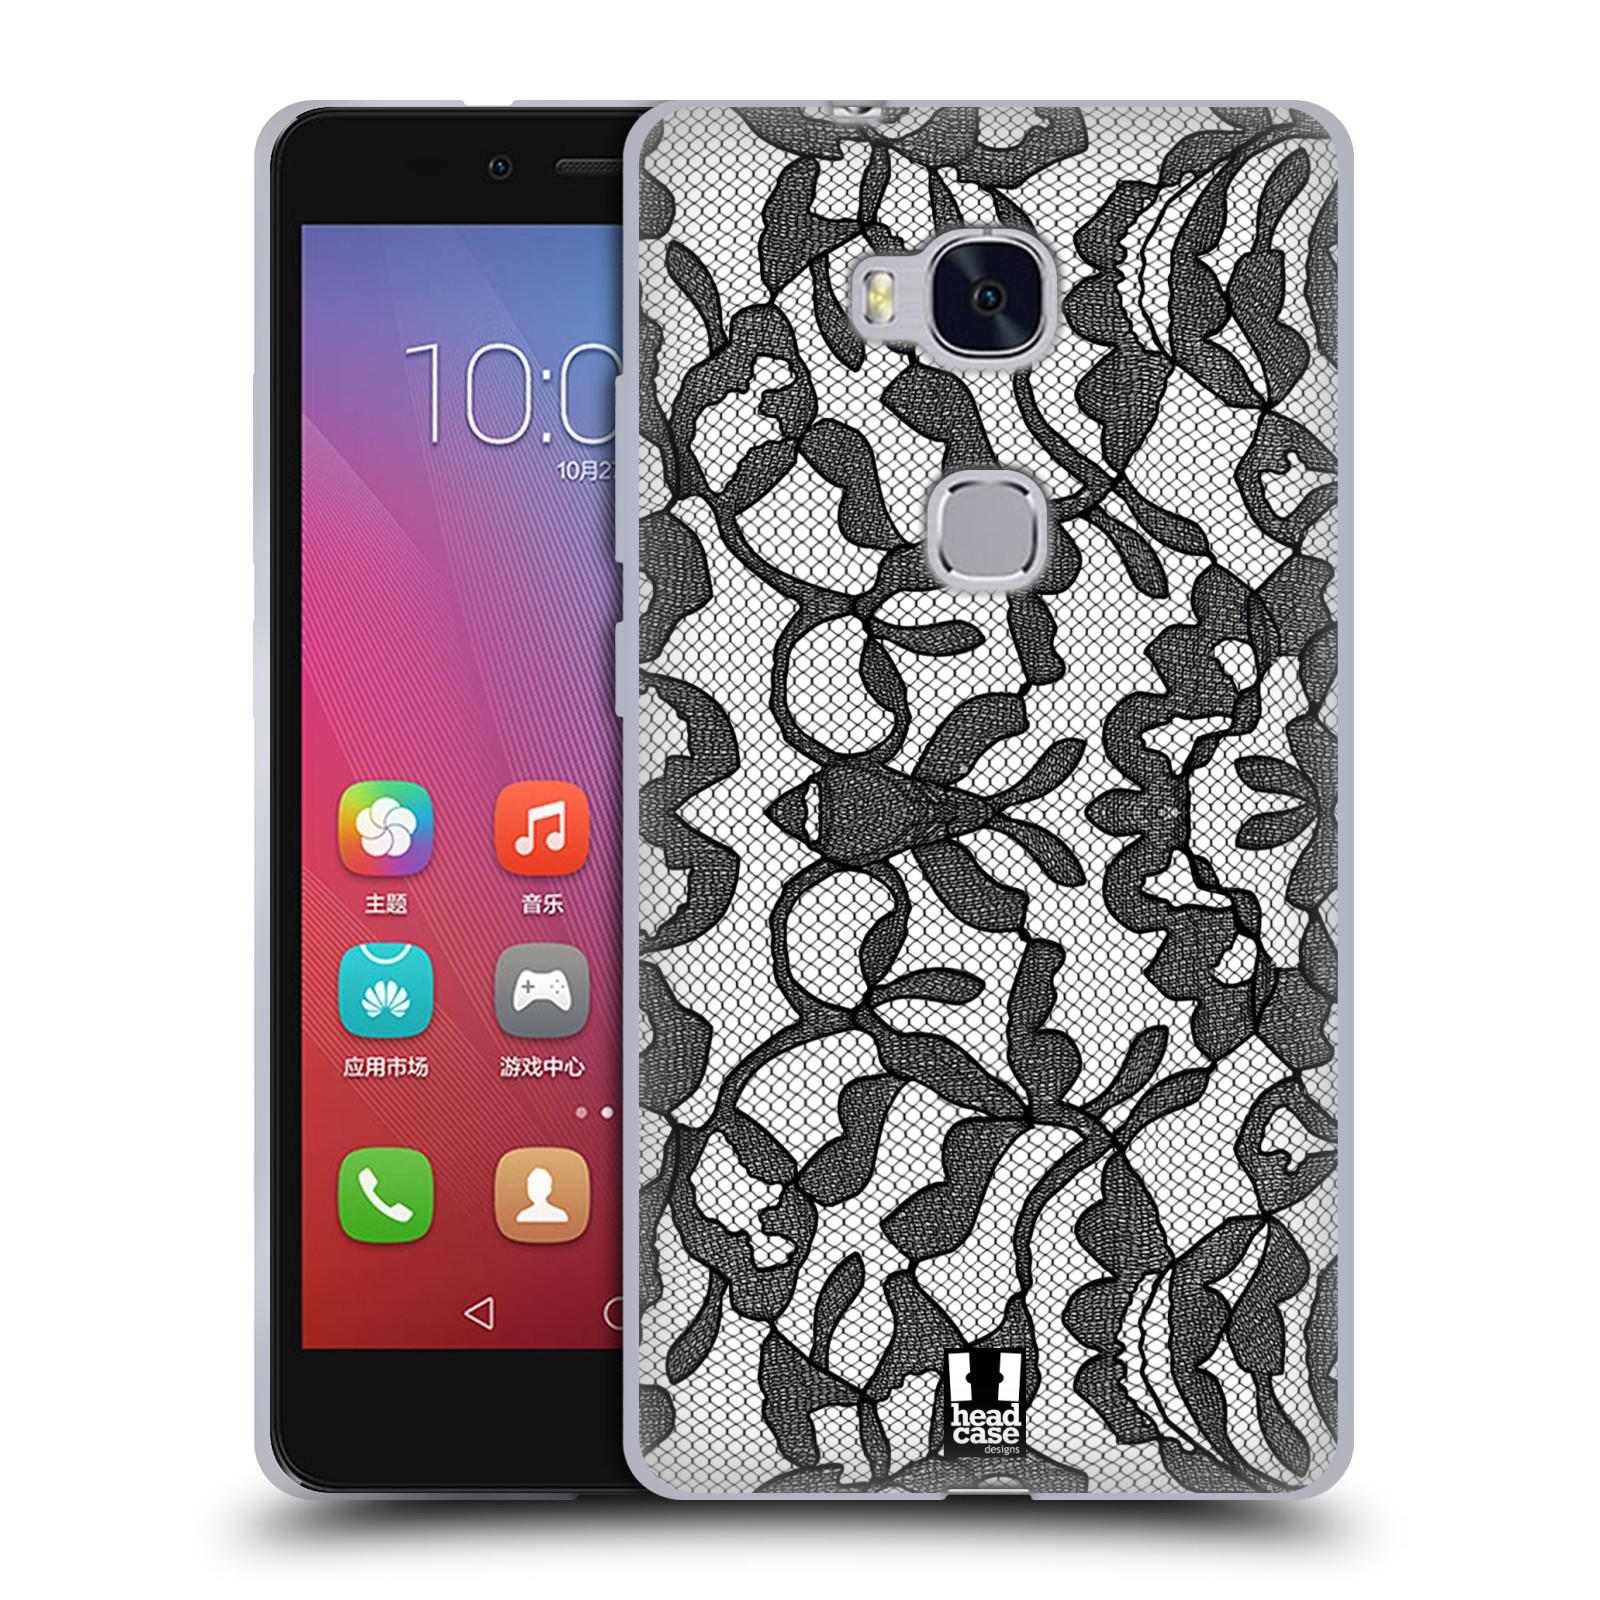 Silikonové pouzdro na mobil Honor 5X HEAD CASE LEAFY KRAJKA (Silikonový kryt či obal na mobilní telefon Huawei Honor 5X)